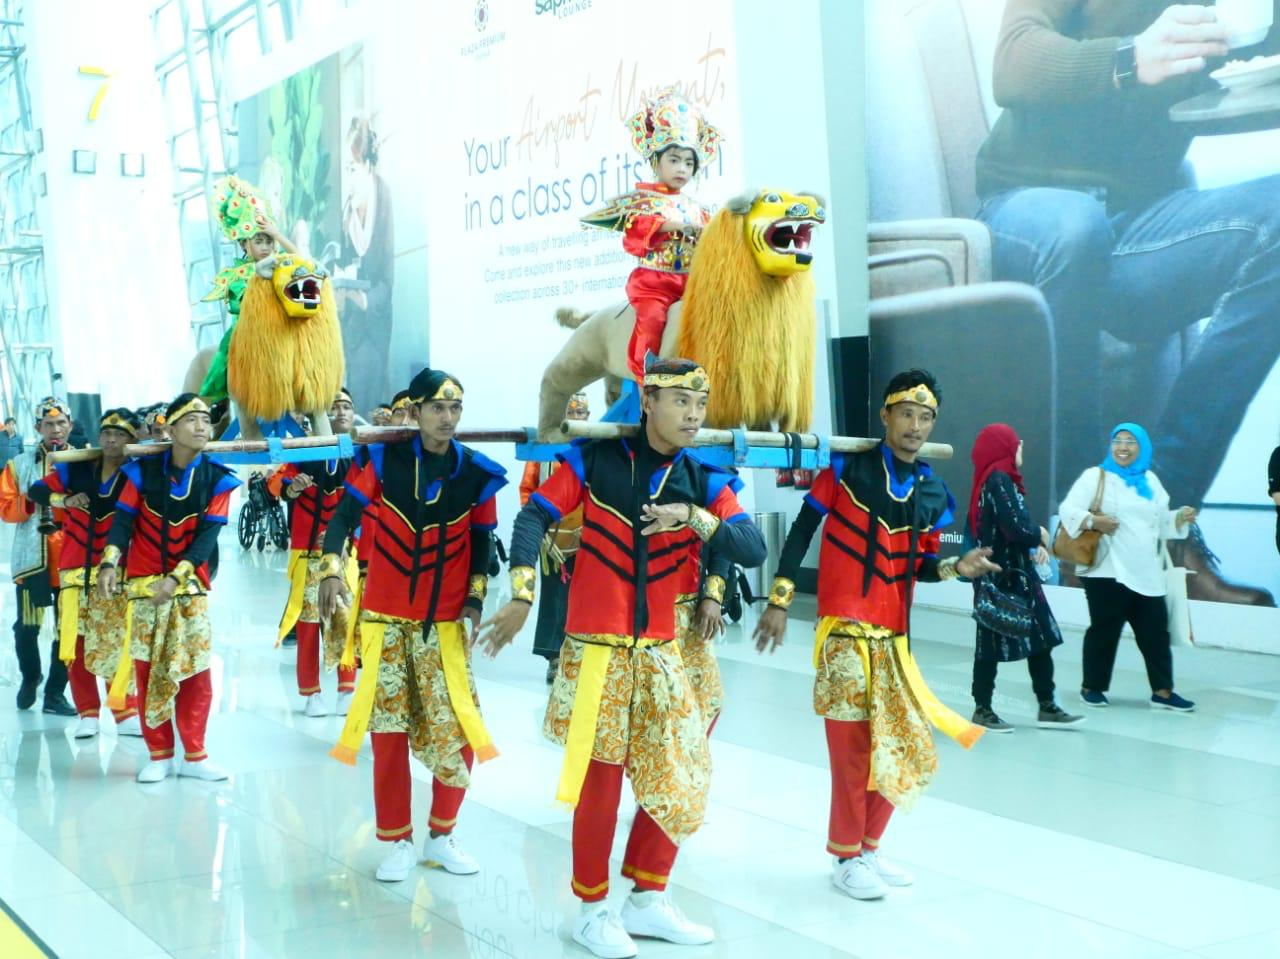 Peragaan seni dan budaya di Bandara Internasional Soekarno-Hatta | Foto: Angkasa Pura II